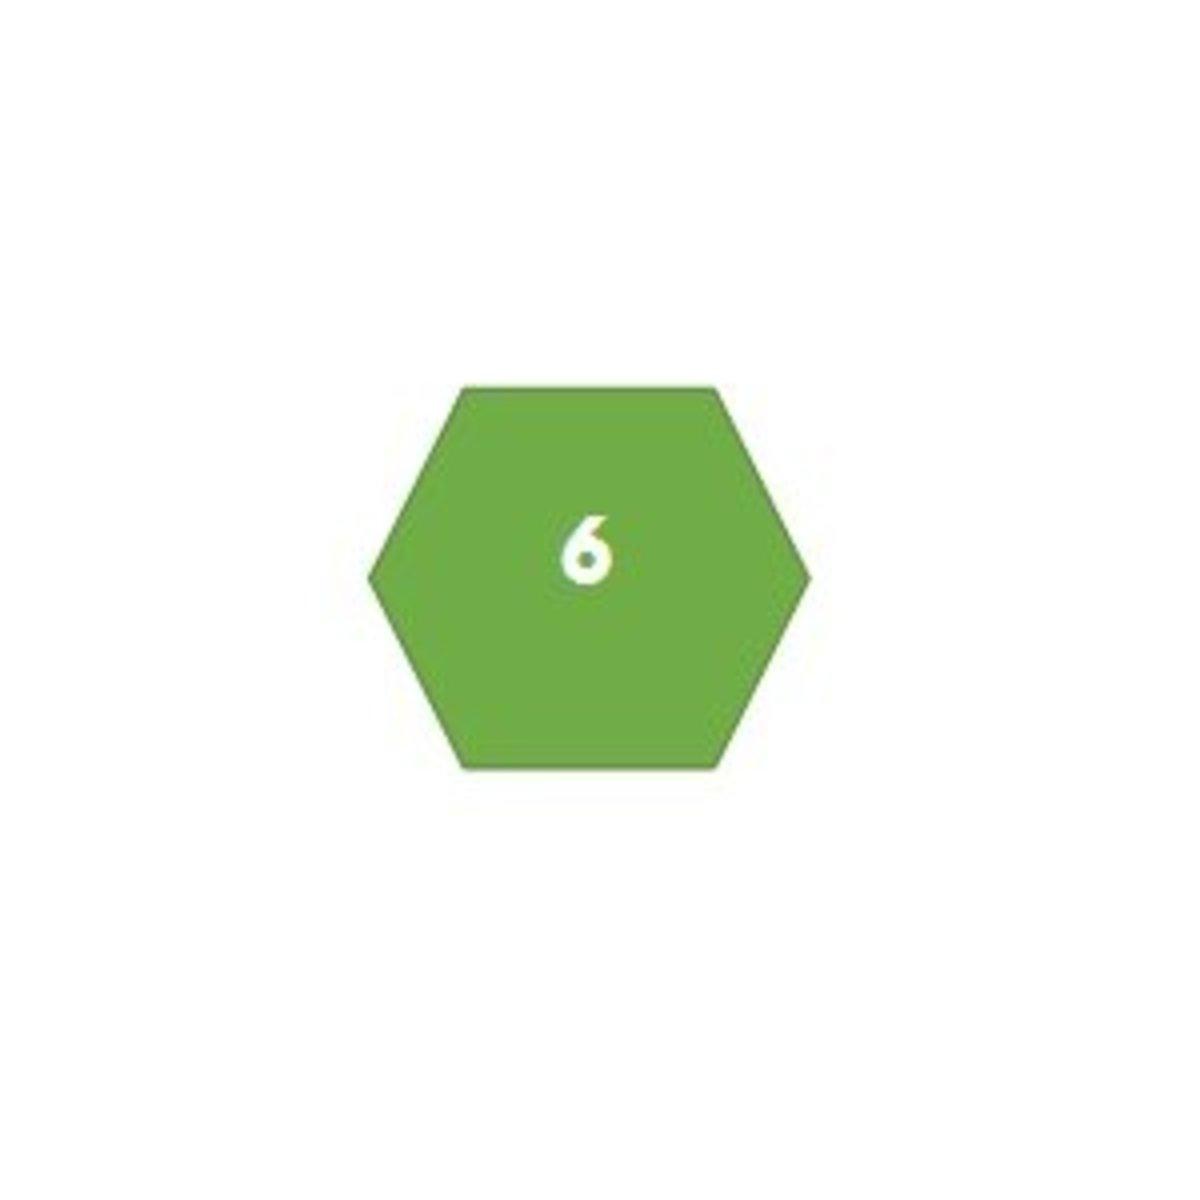 A hexagon has 6 sides.